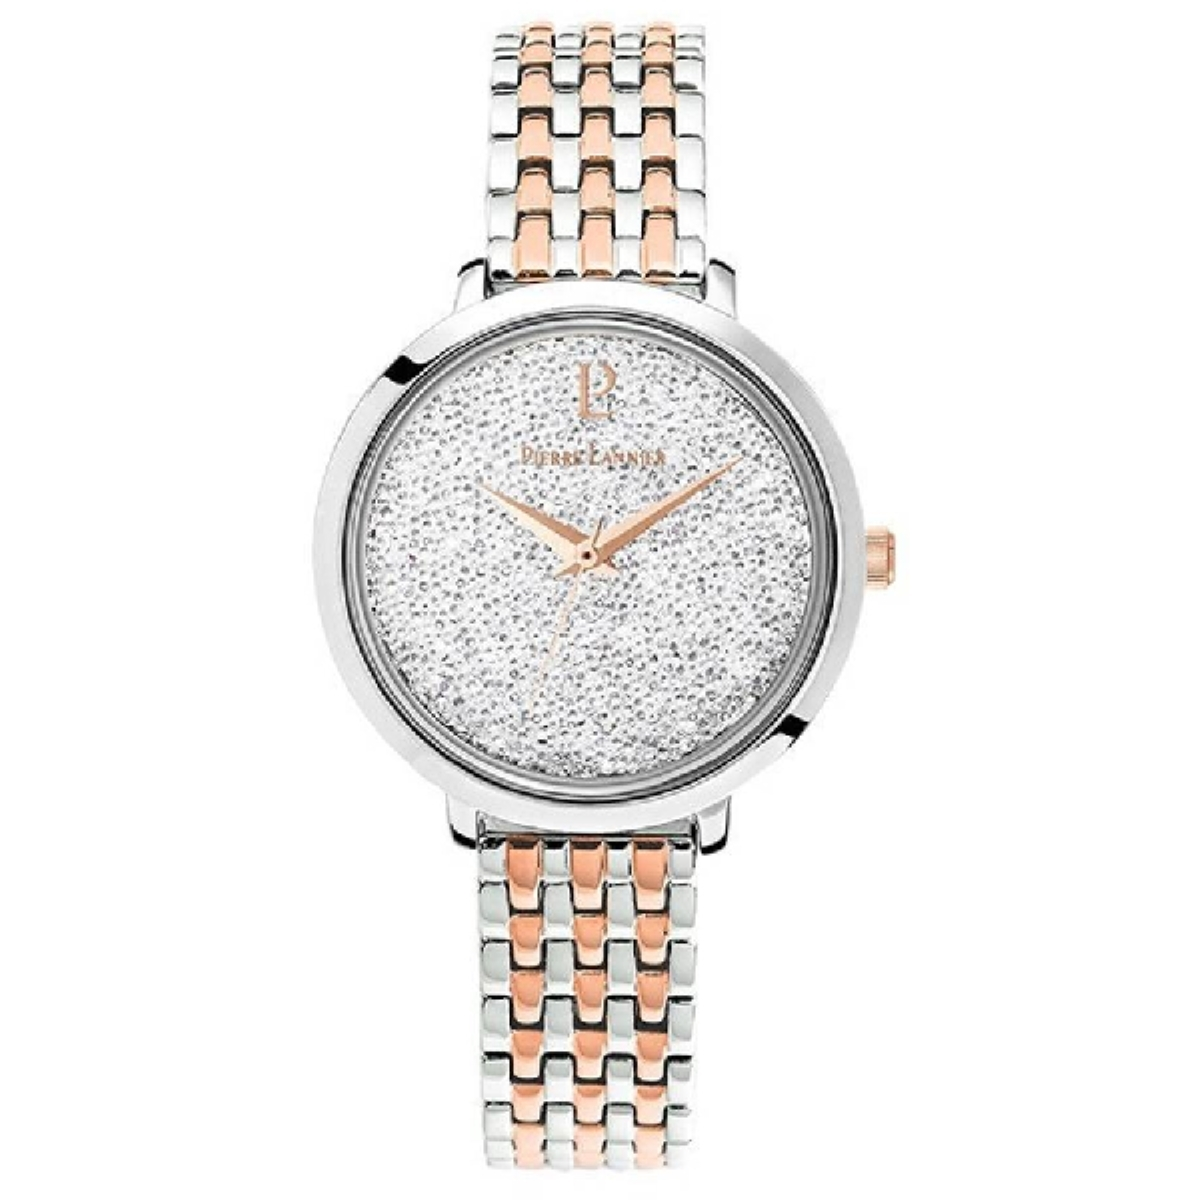 Женские часы Pierre Lannier La Petit Cristal 110J608